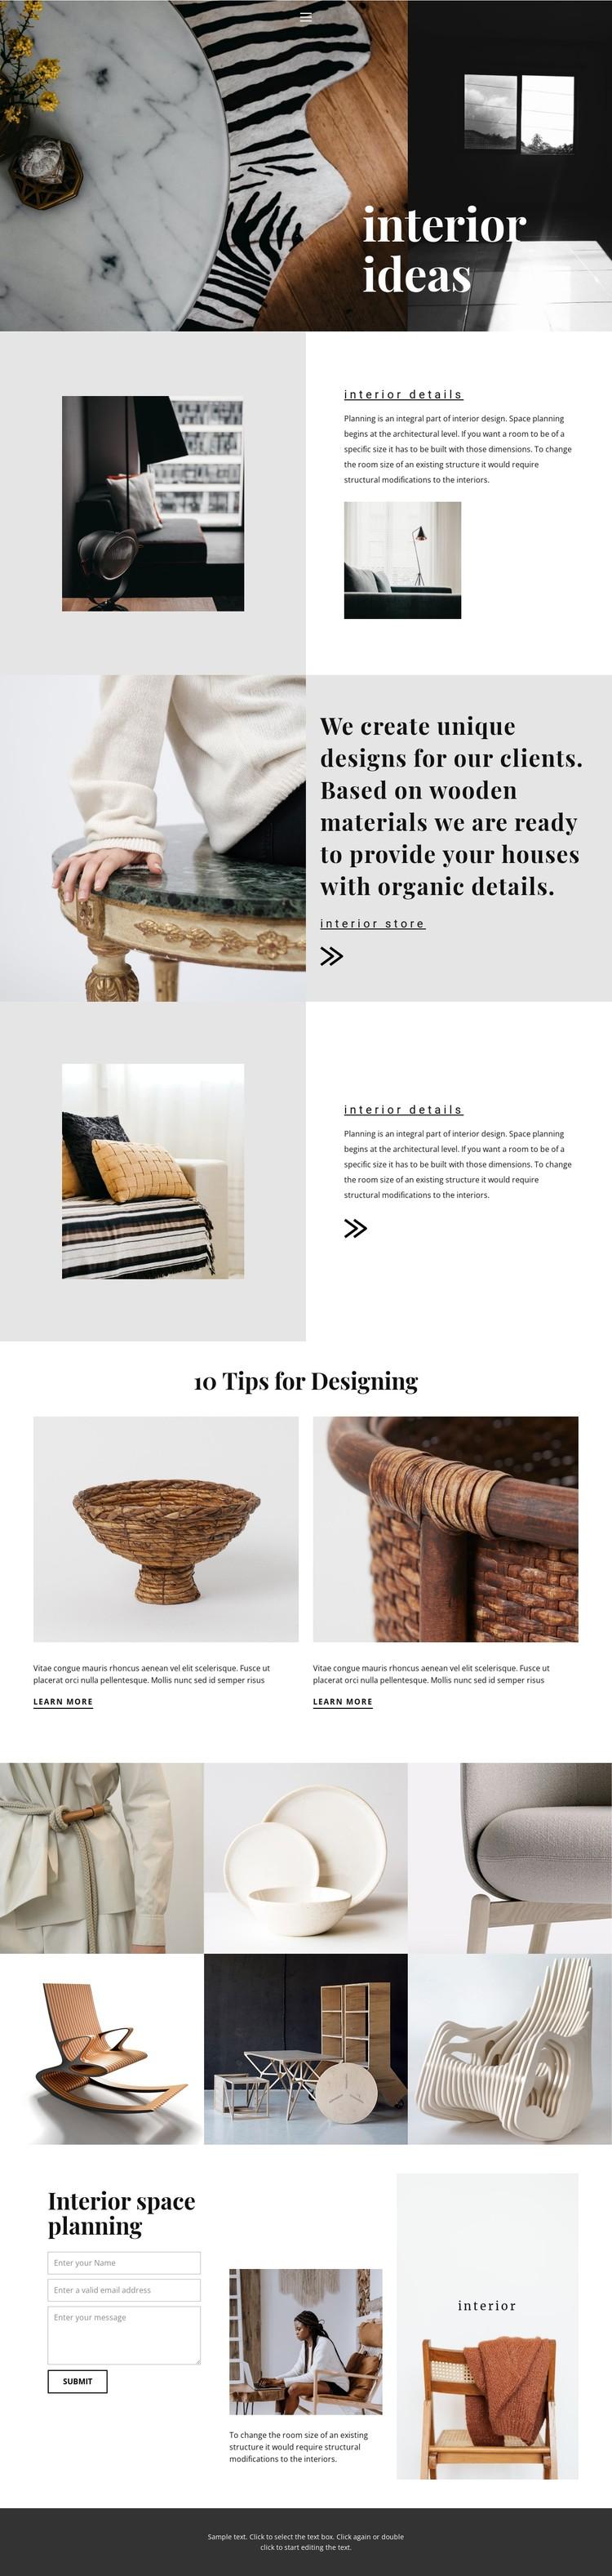 New interior ideas CSS Template